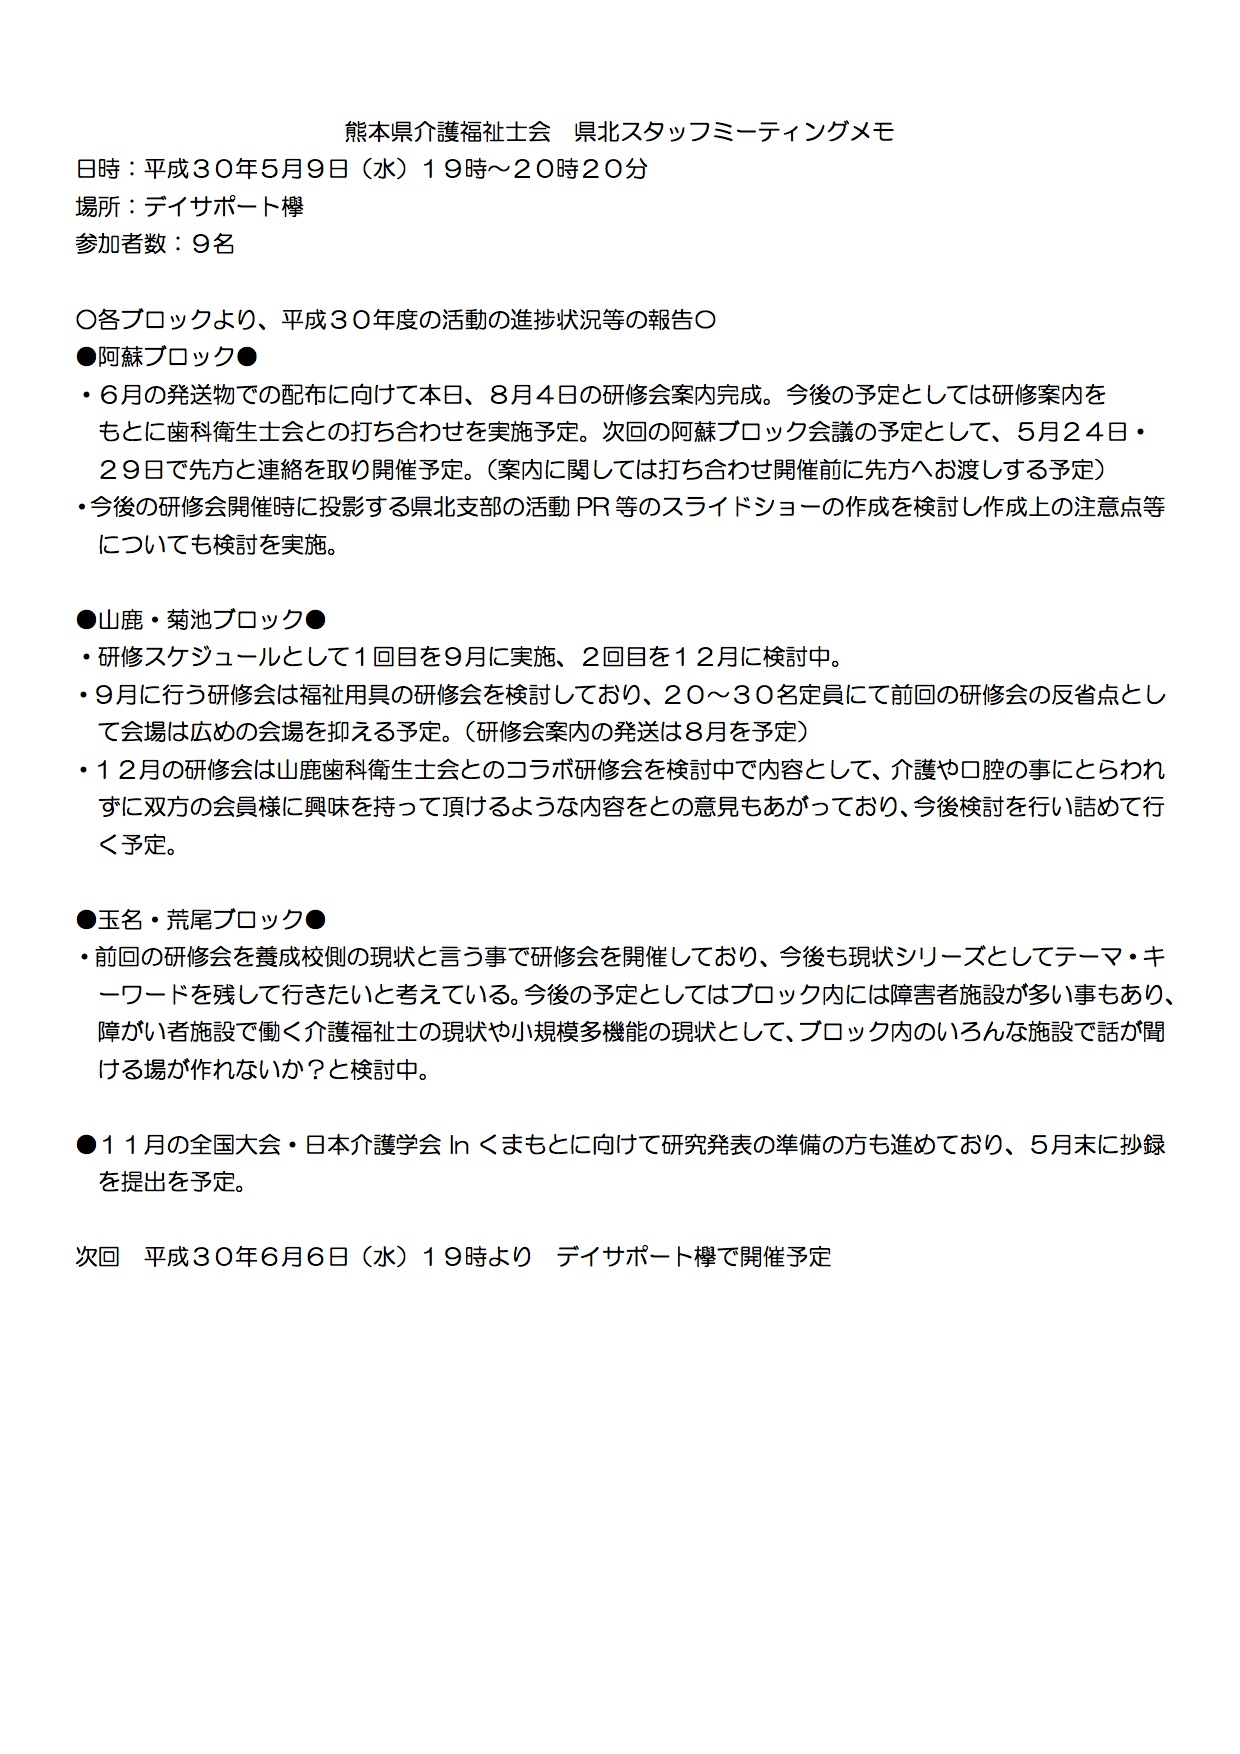 H30.5月9日県北スタッフミーティングメモ